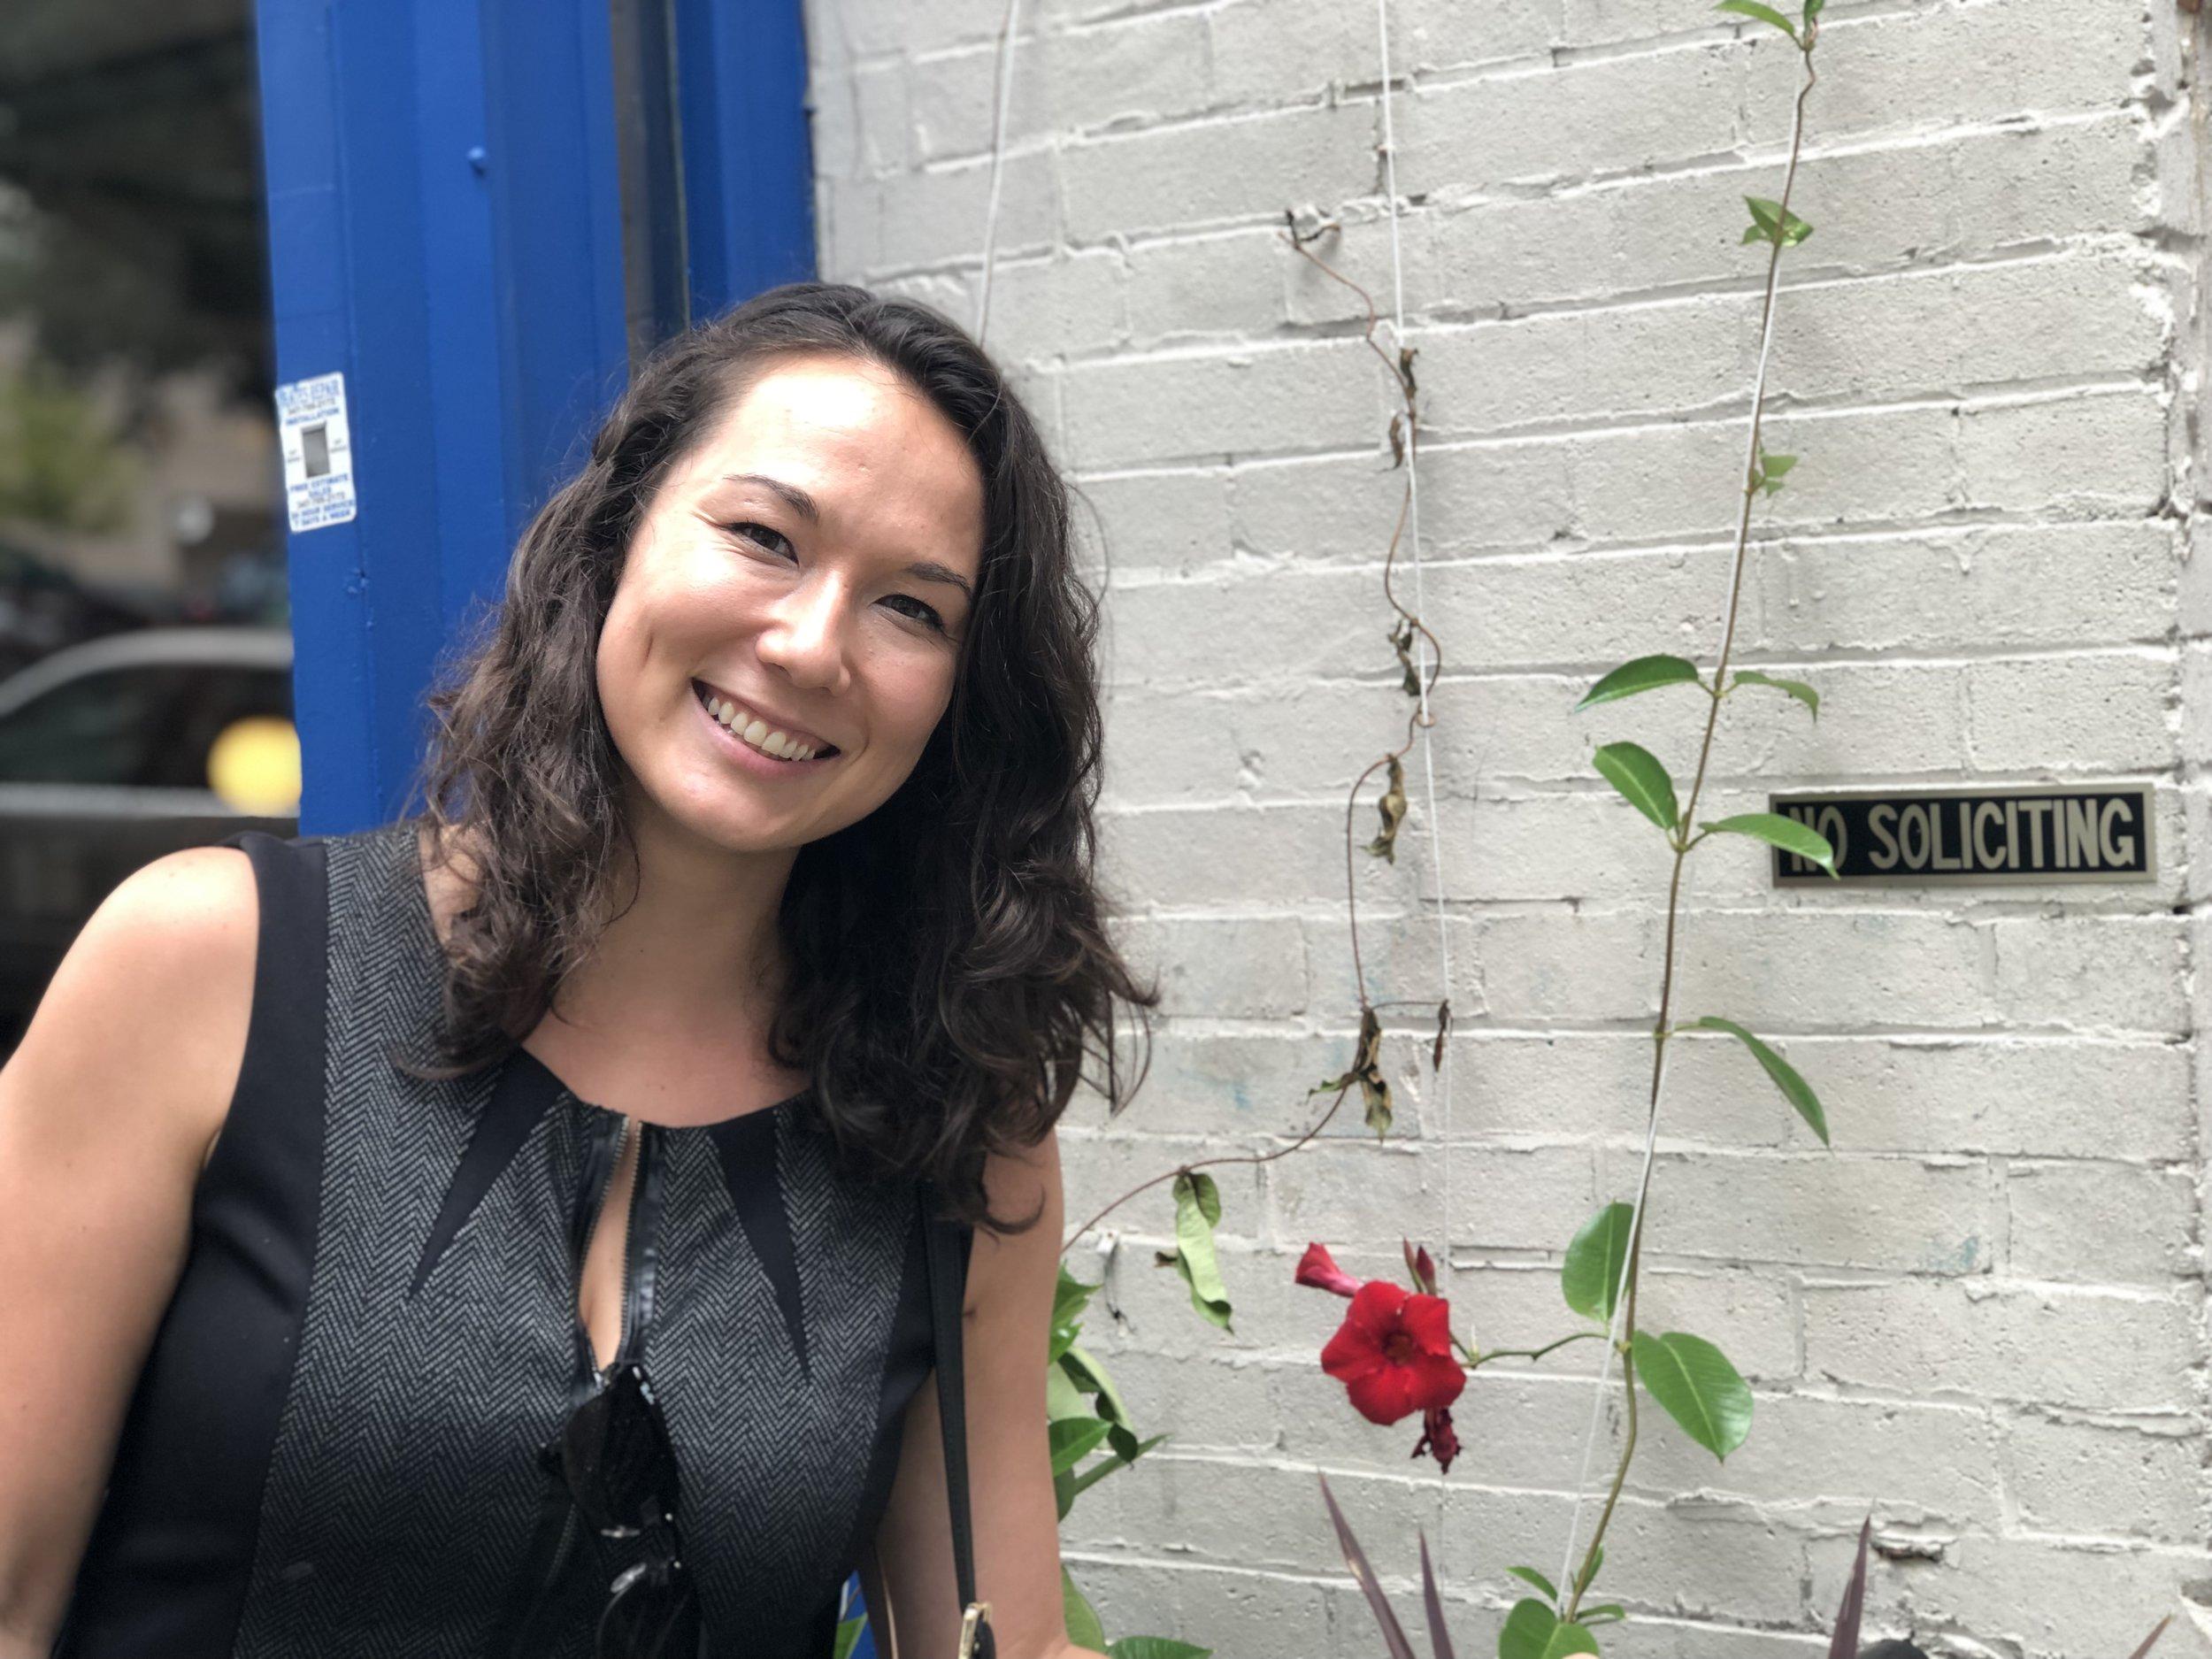 Lisa Keitges, New York, NY, August 2019